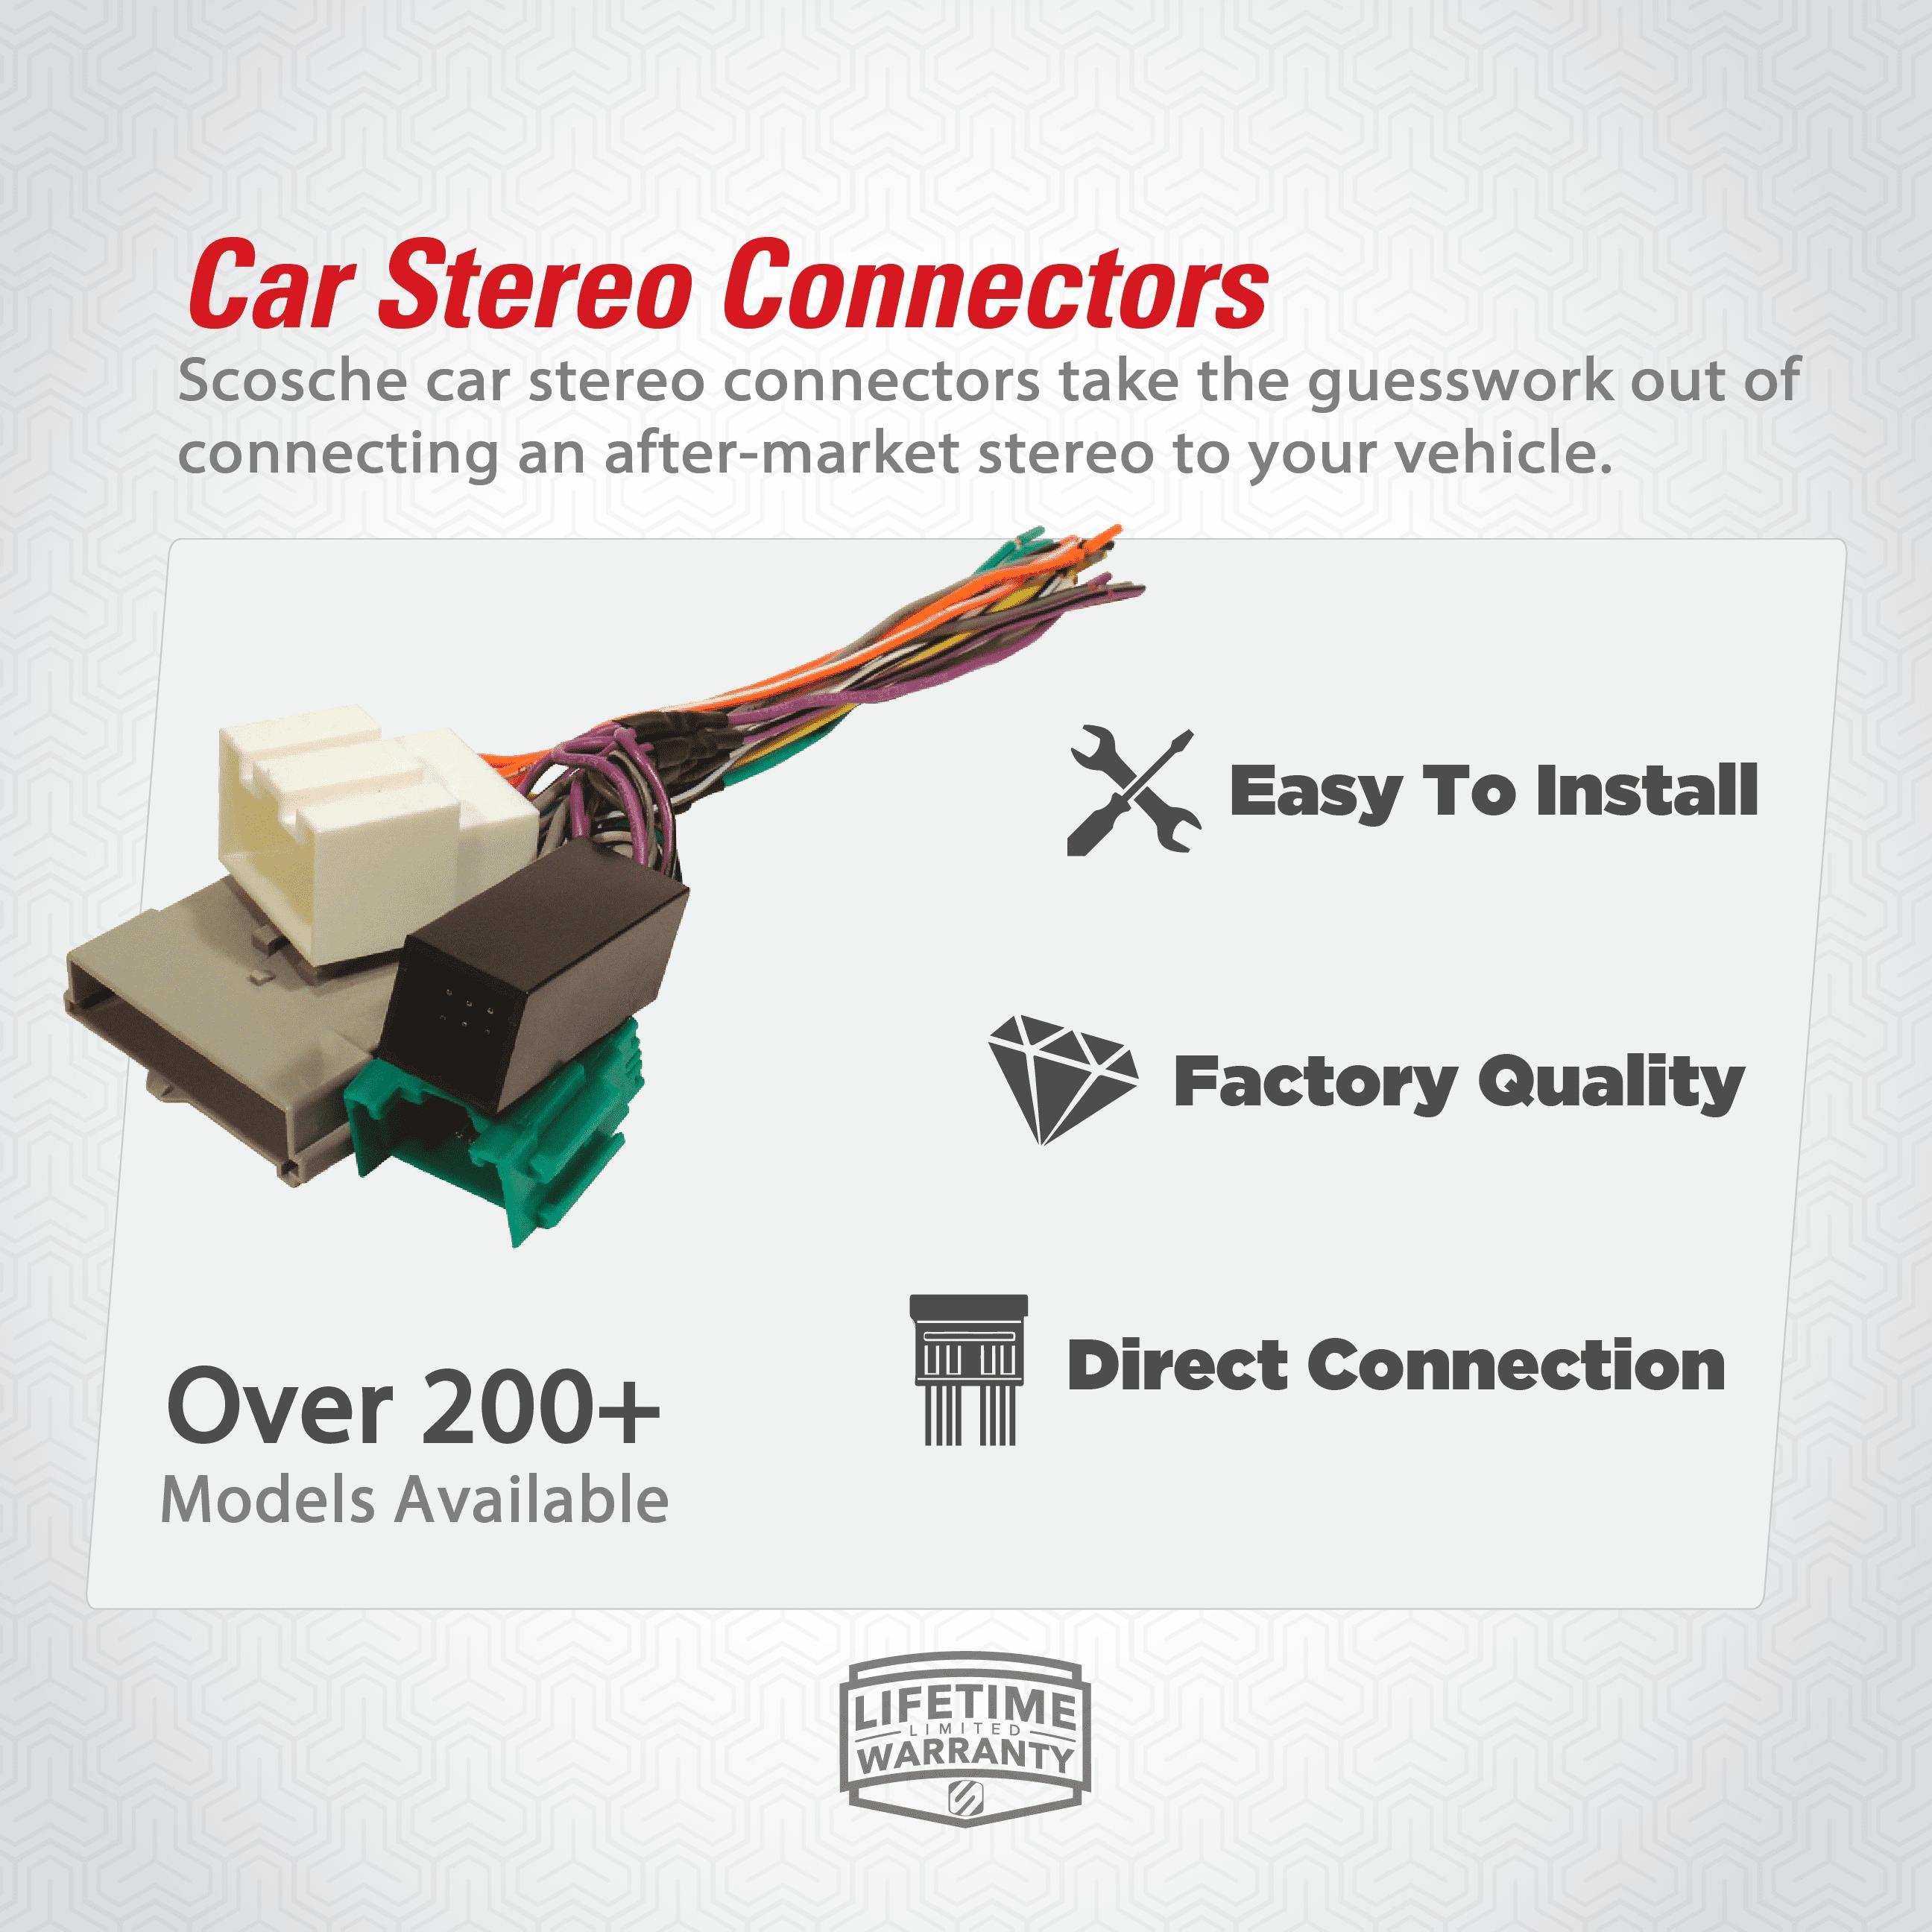 Scosche GM035 Car / Truck / SUV Stereo Connector - Walmart.com - Walmart.com [ 2592 x 2592 Pixel ]